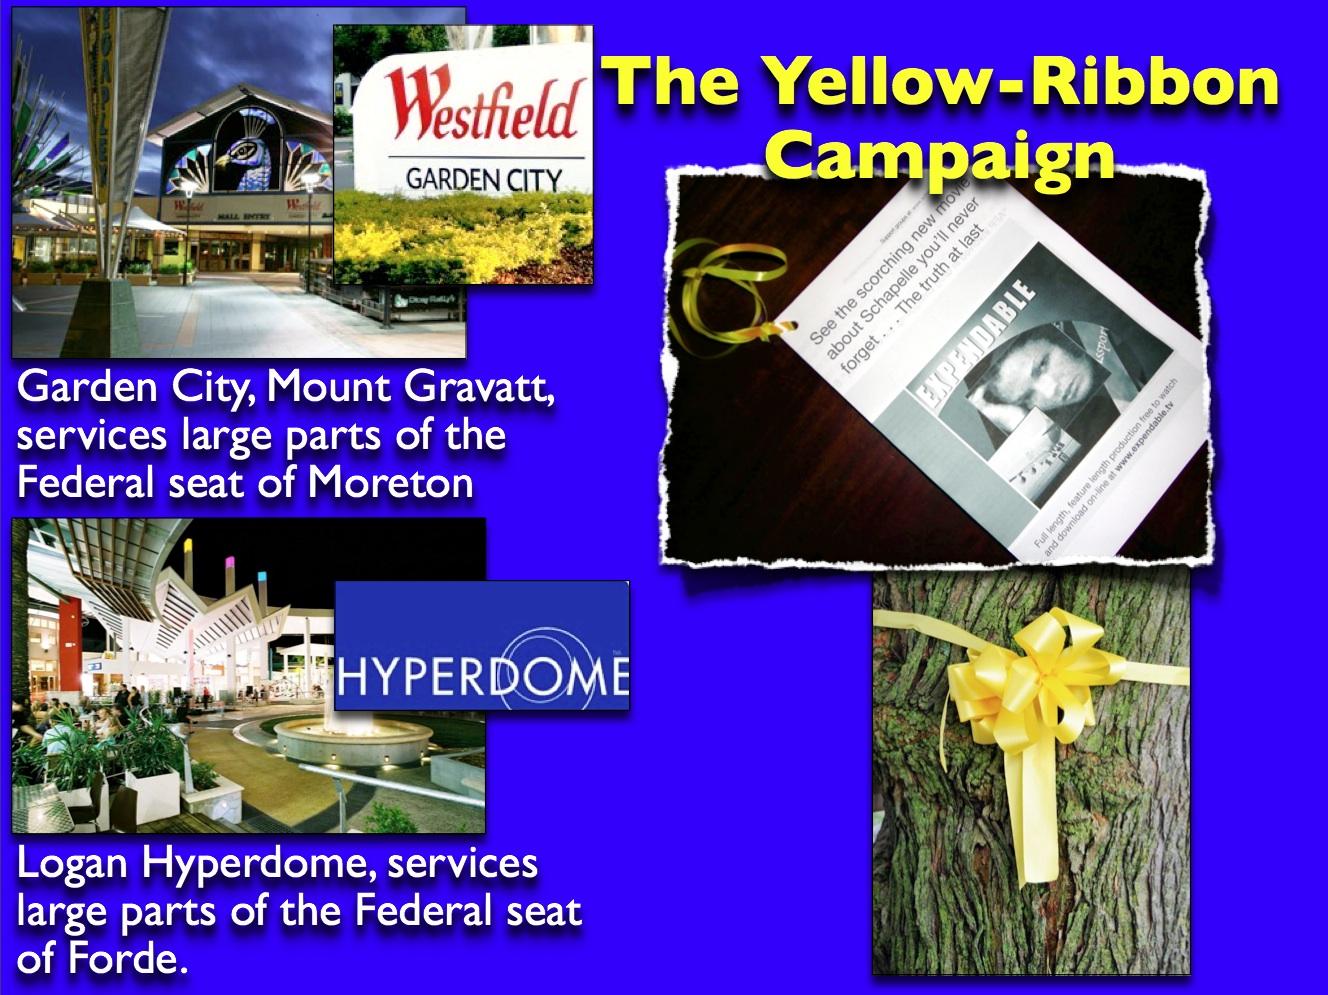 http://2.bp.blogspot.com/-RAFsPrCOcrc/T0oaAGeV3jI/AAAAAAAACQc/opgvqiY3JOM/s1600/yellow%2Bribbon%2Bjpeg.jpg